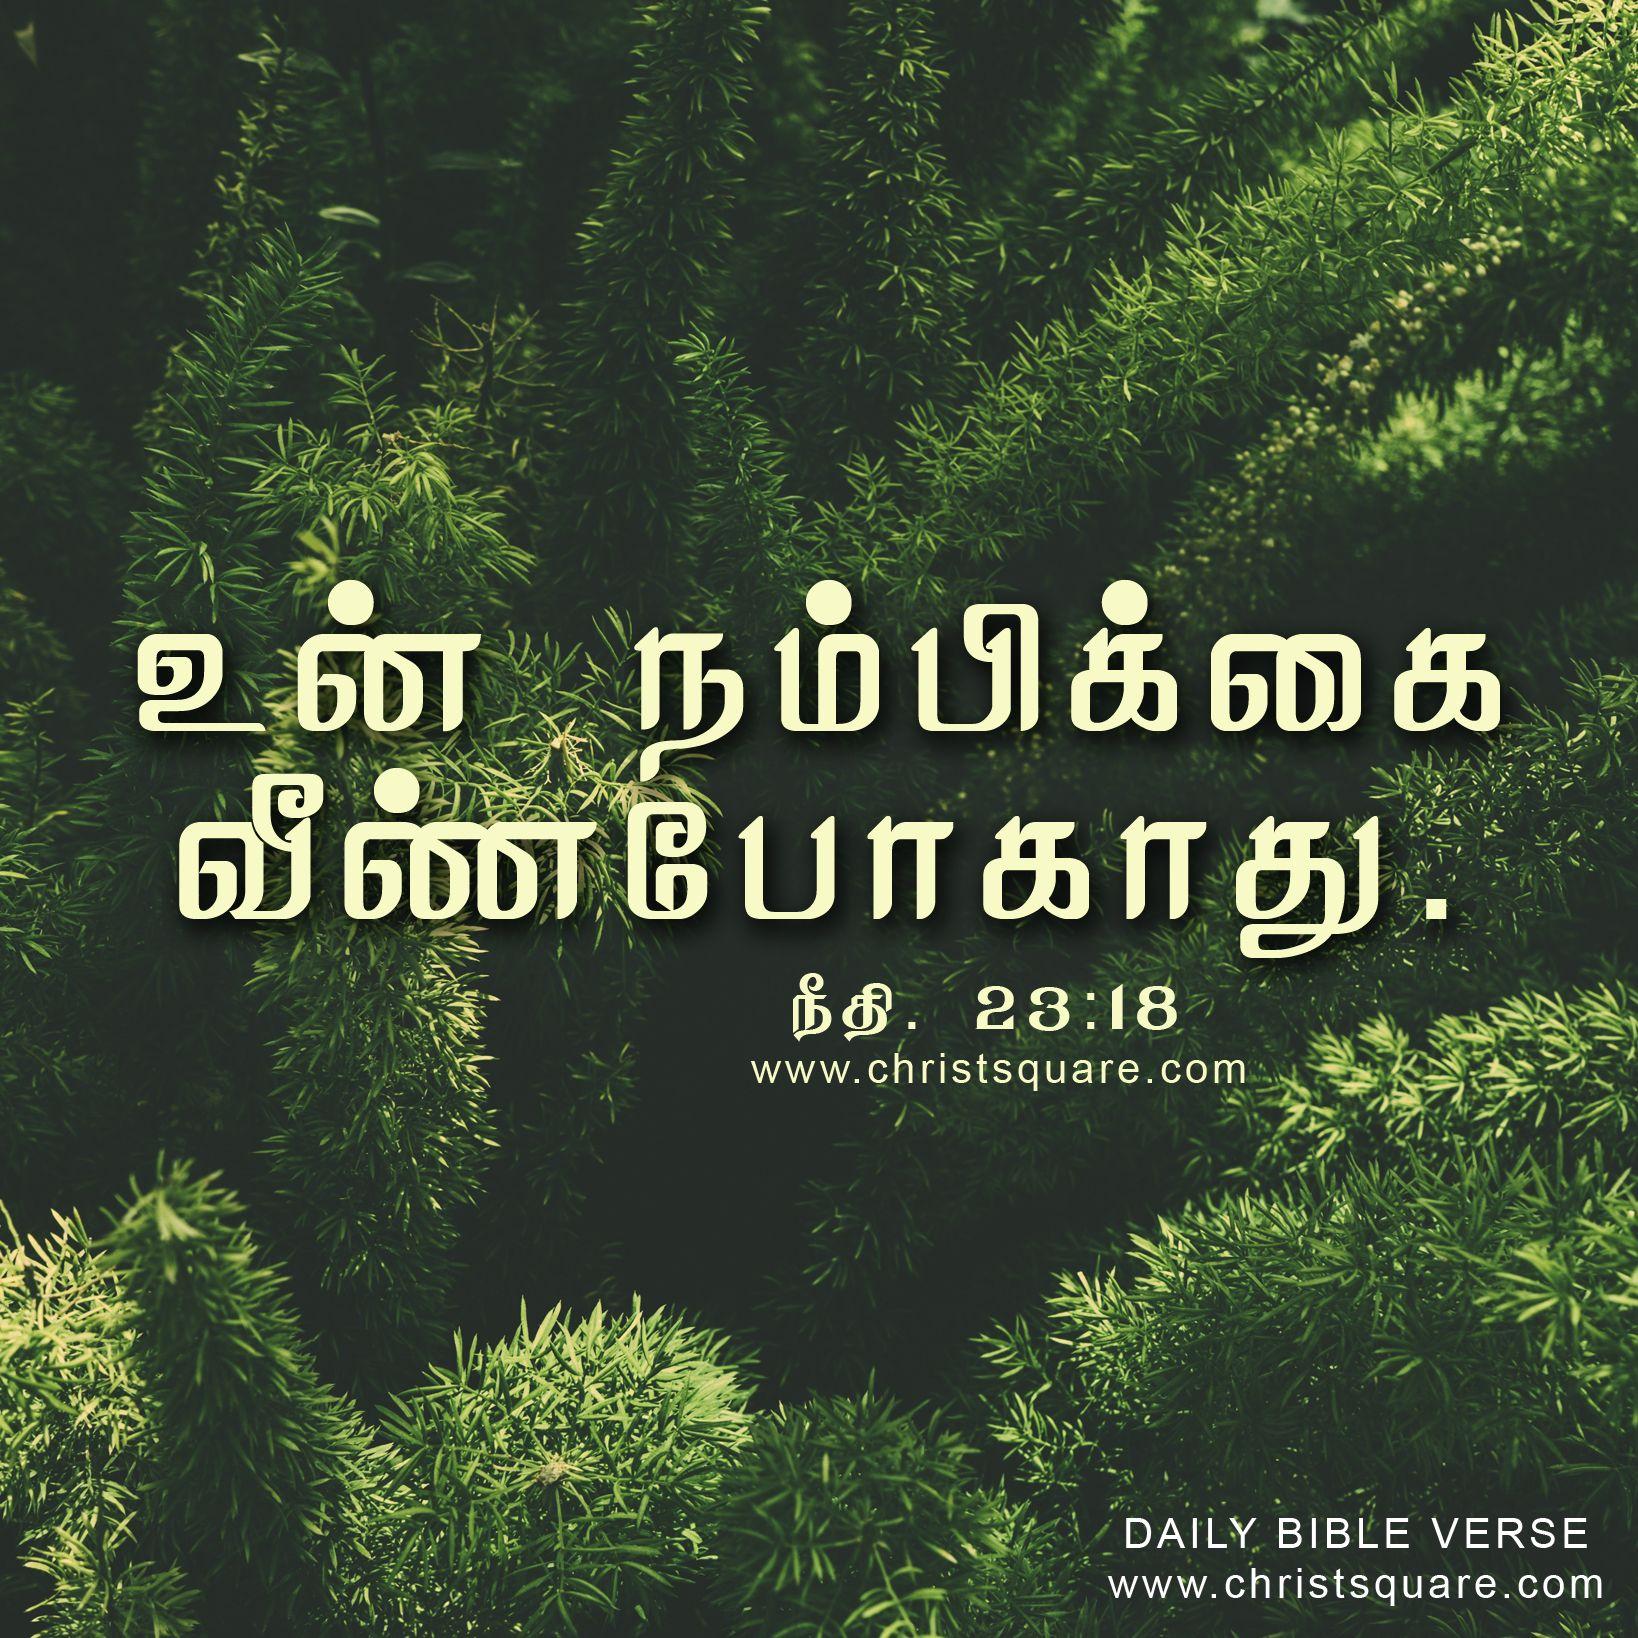 Tamil Christian Wallpaper HD Words Image